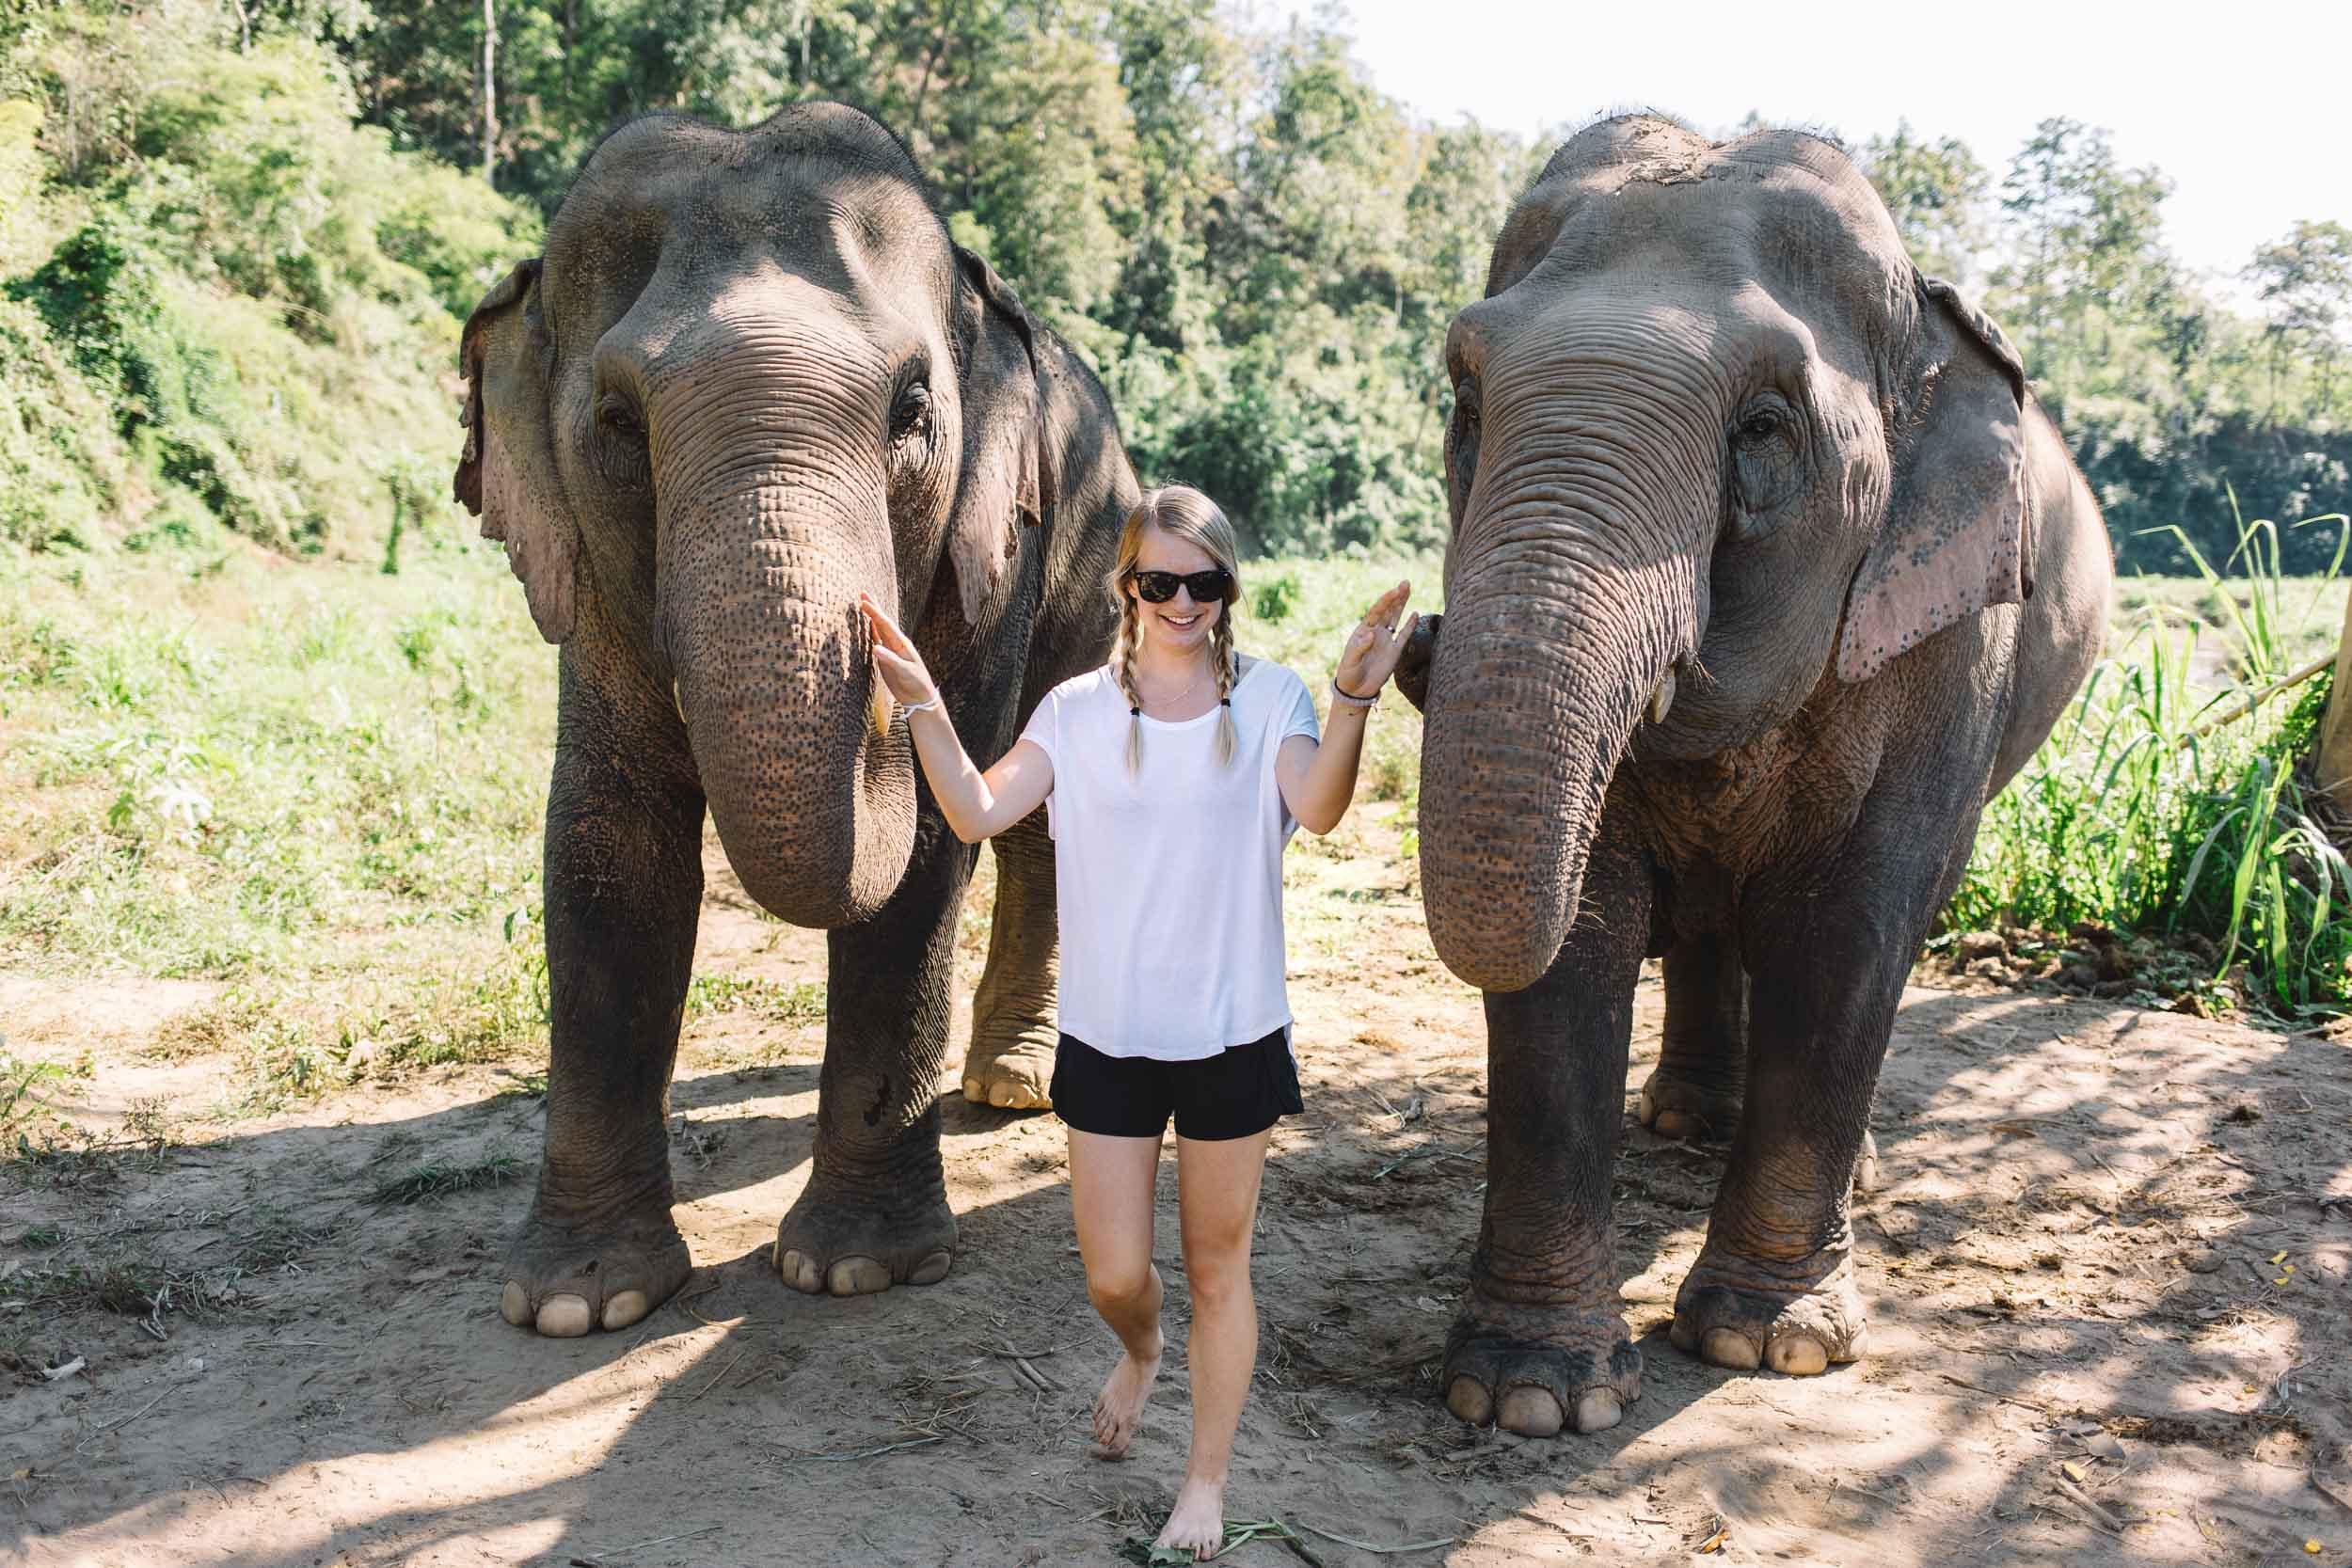 thailand_budget_travel_046.jpg